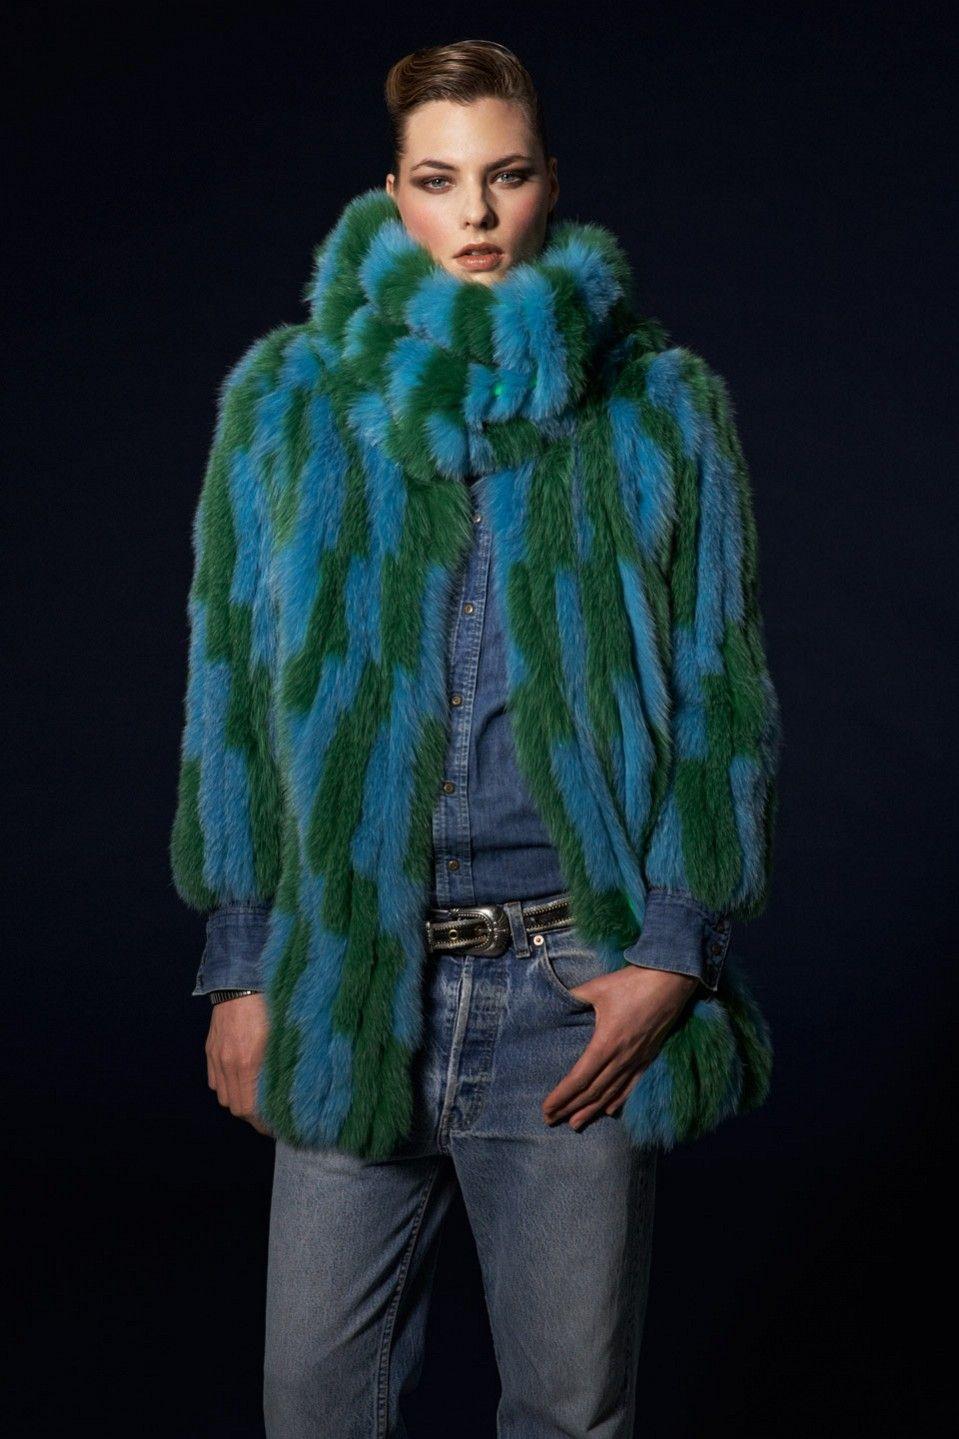 Hockley | Splash Collection | Gloriosa fox coat | £2,111 | Worn with Freesia snood